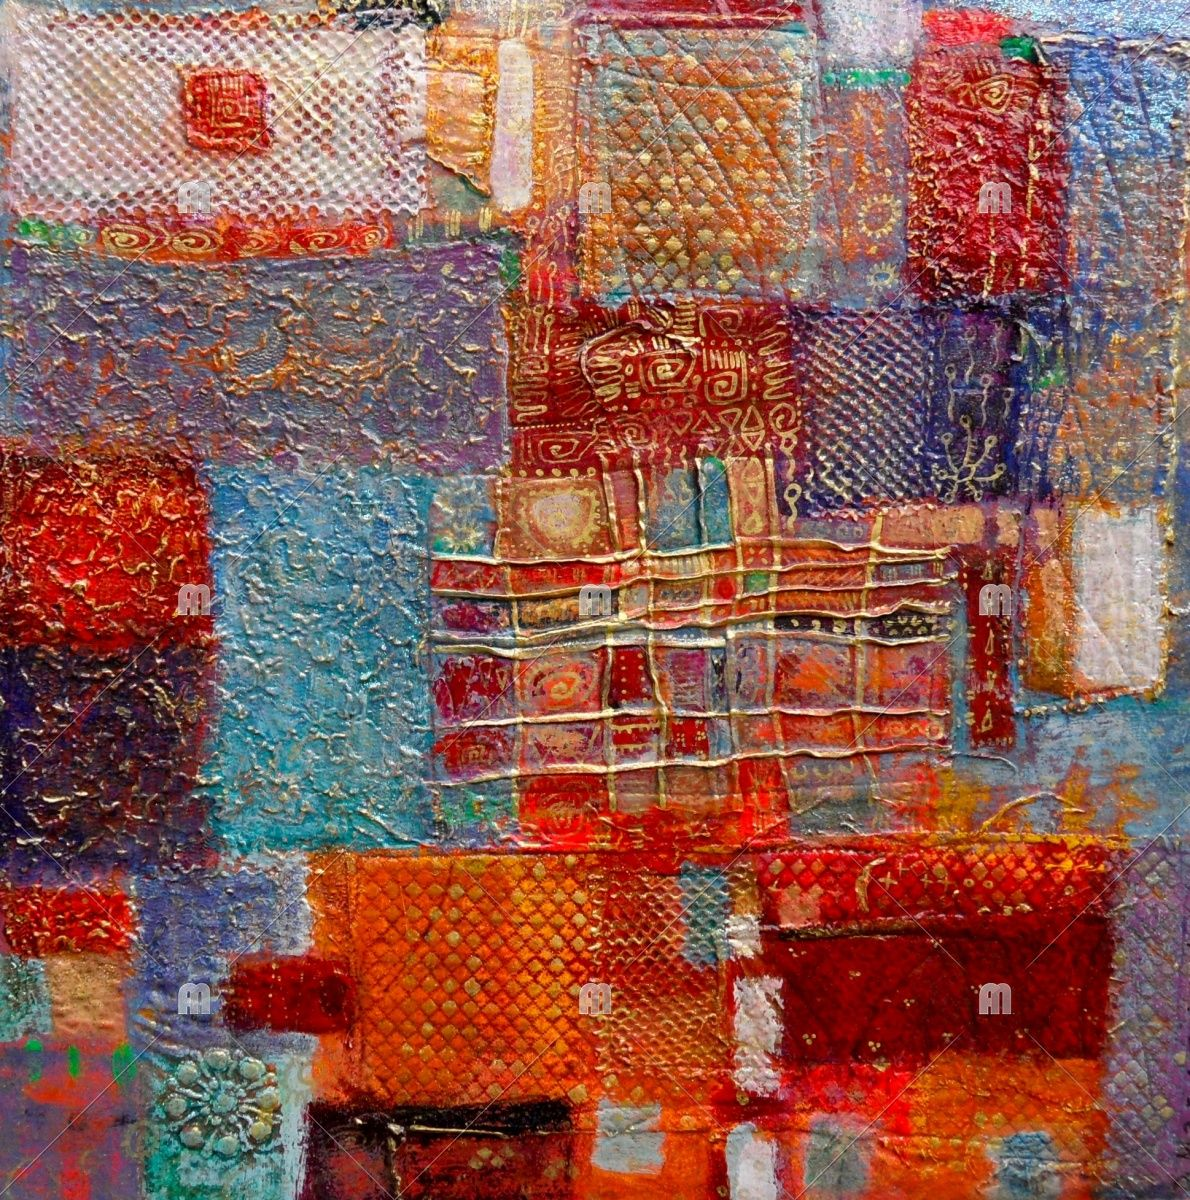 Bazaar | dorothy marczinko | Foundmyself (acrylic over layered textiles)